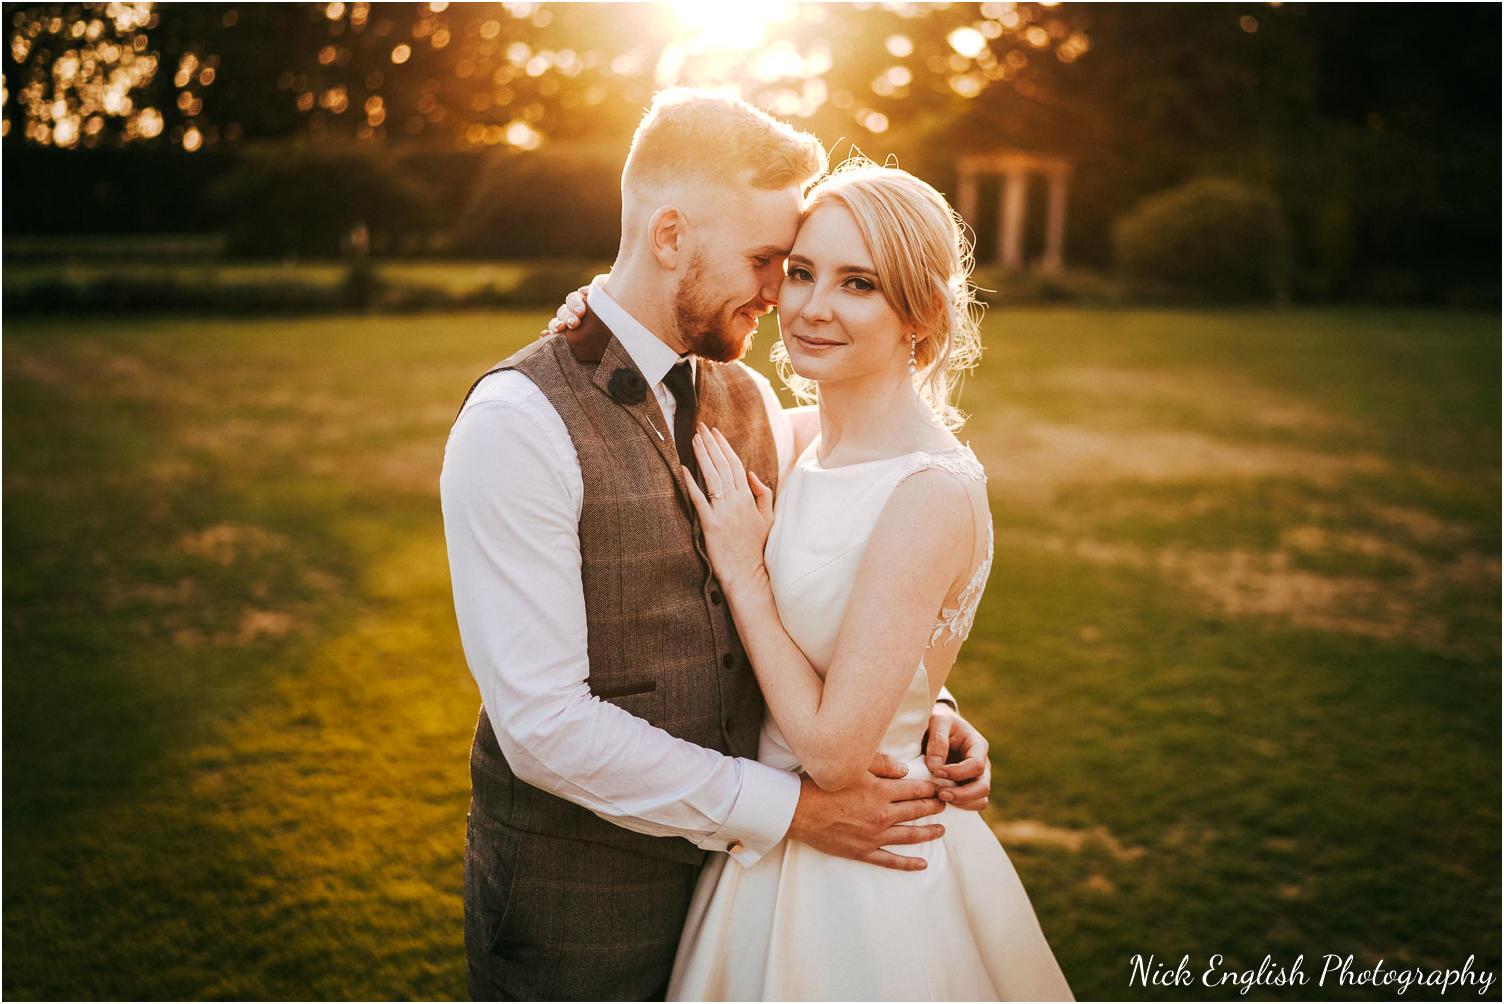 Eaves_Hall_Outdoor_Wedding_Photograph-84.jpg